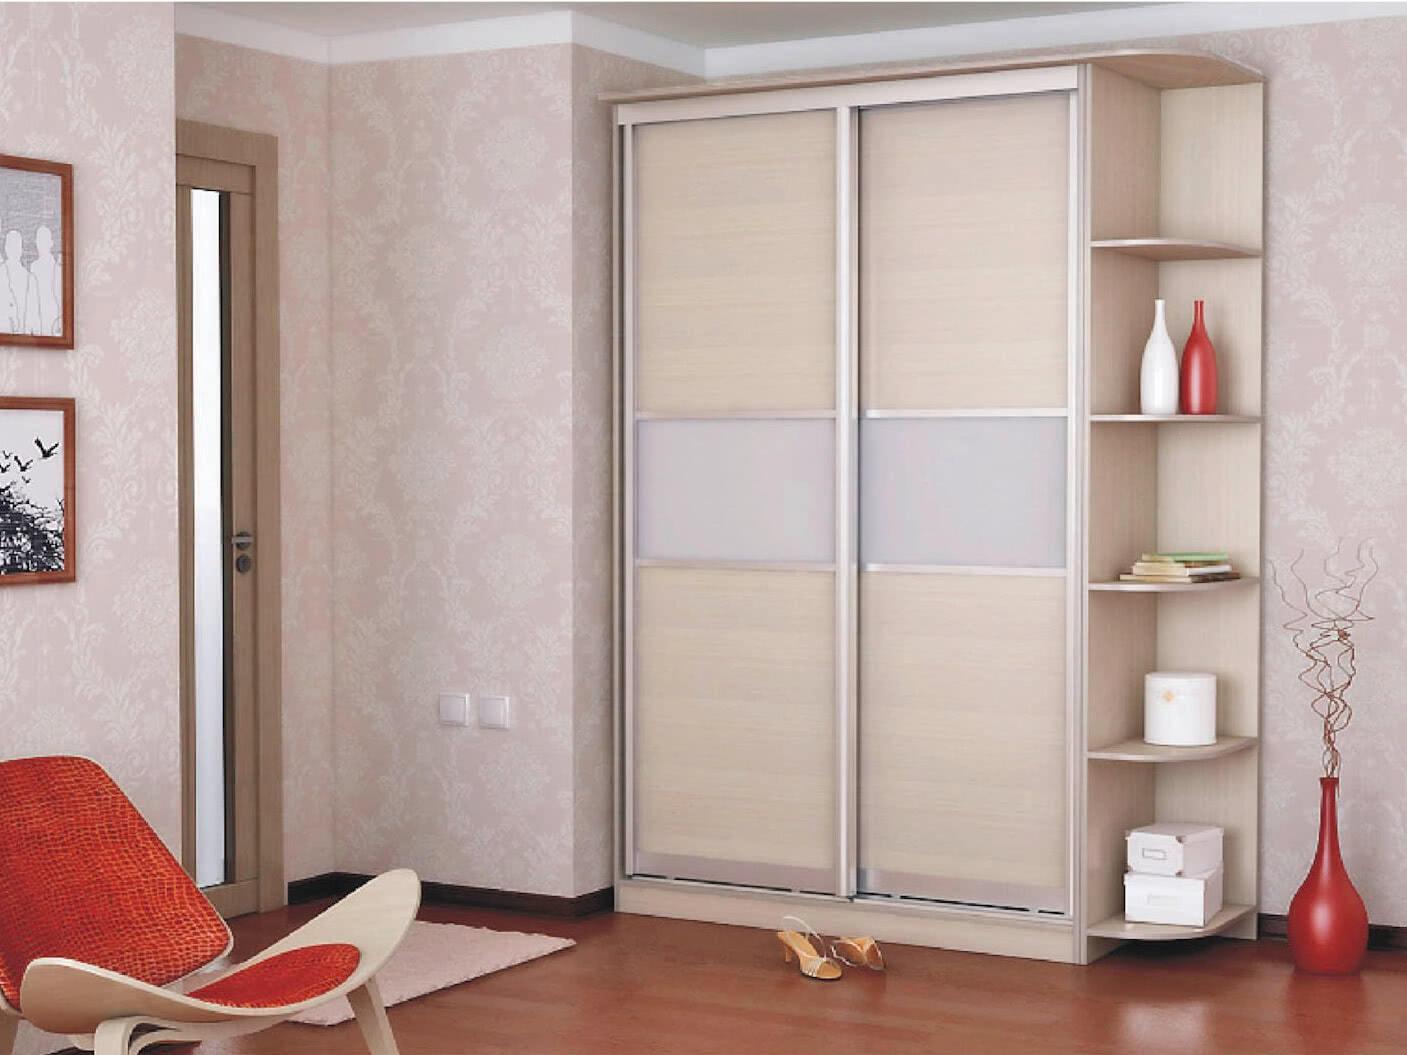 Матовый шкаф купе. матовые двери для шкафа. балтийский шкаф:.